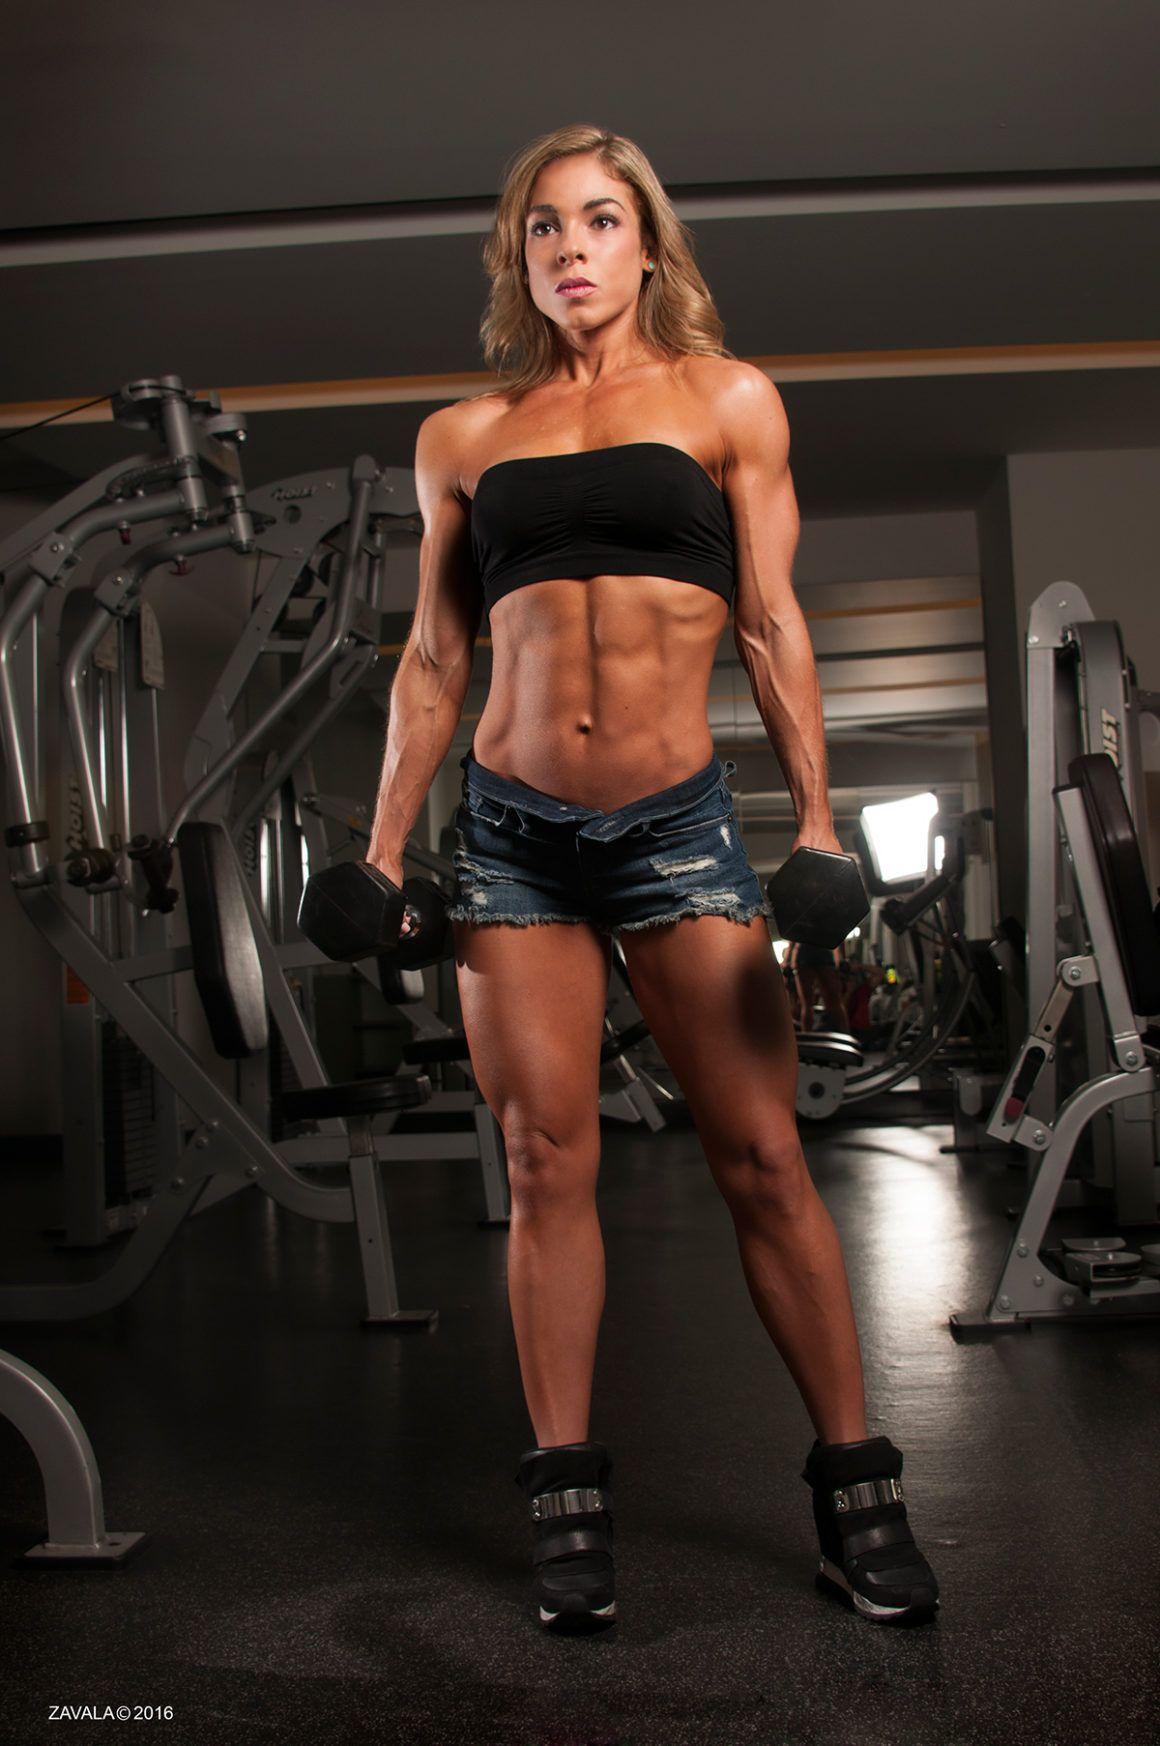 Regina Villareal - Bikini Fitness Athlete - Scilabs Nutrition Team Member